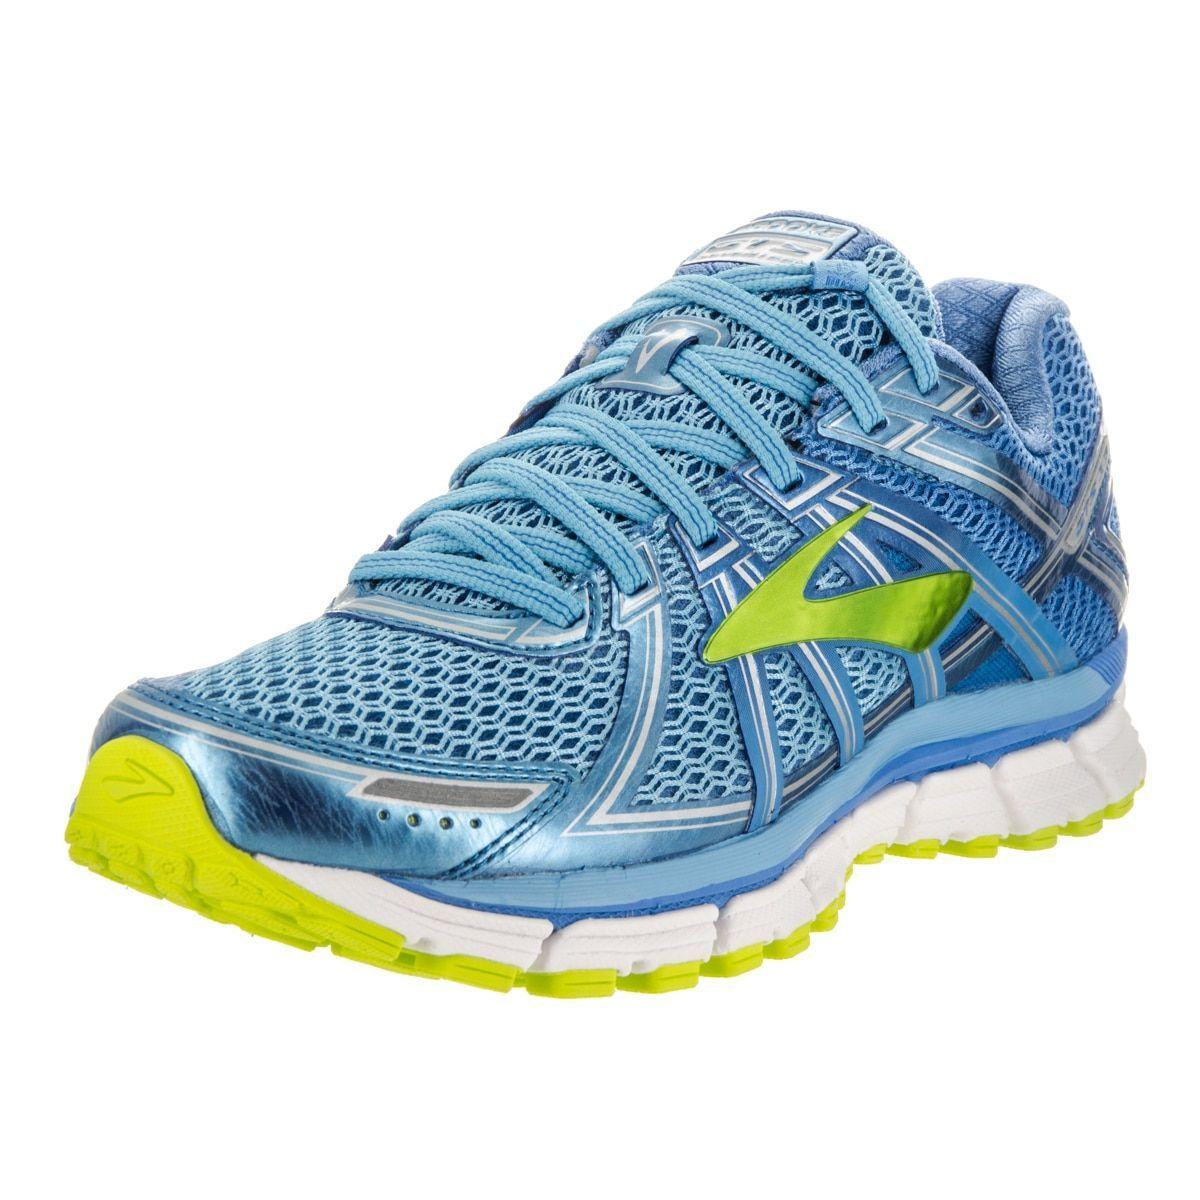 11e18df27b4 Brooks Women s Adrenaline GTS 17 Running Shoes